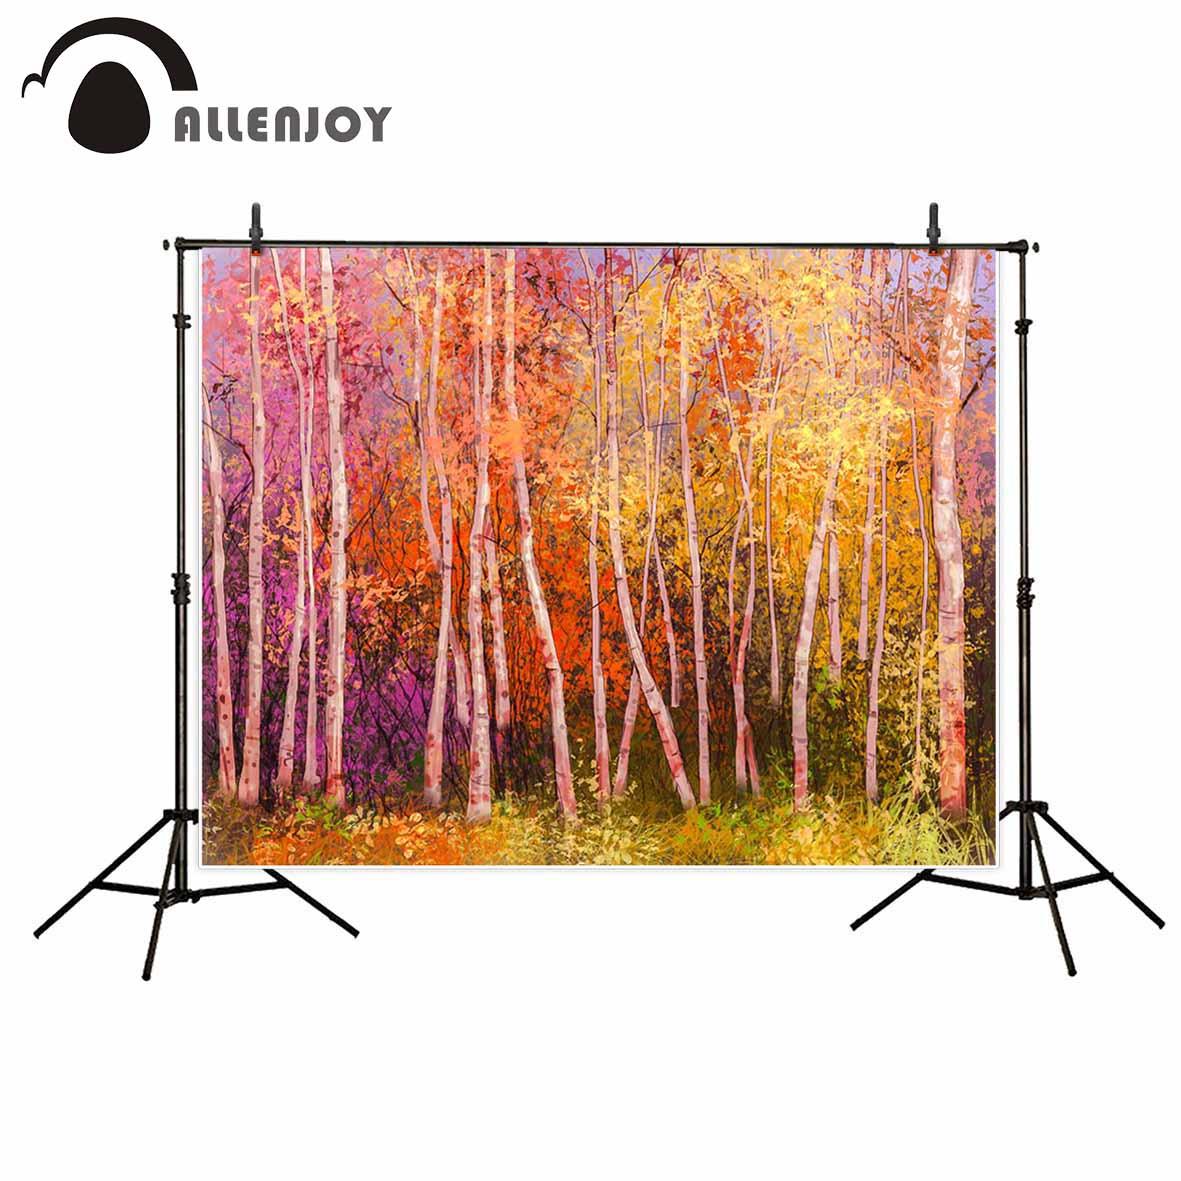 Fondo de fotografía Allenjoy otoño bosque con árboles pintura al óleo colorido telón de fondo photocall decoración retrato